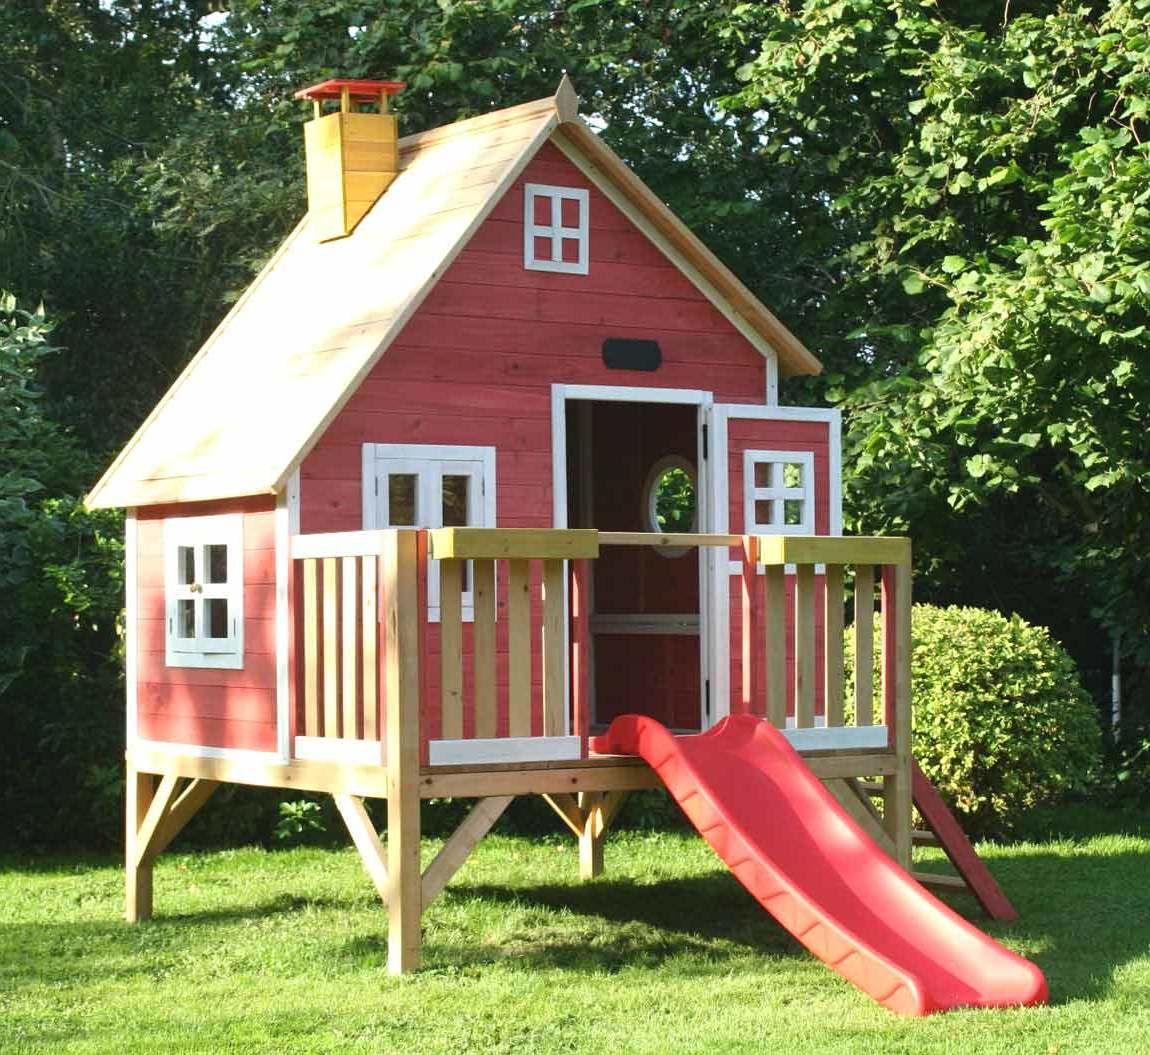 spielhaus garten selber bauen, spielhaus für den garten selber bauen: diy anleitung | outdoor decor, Design ideen